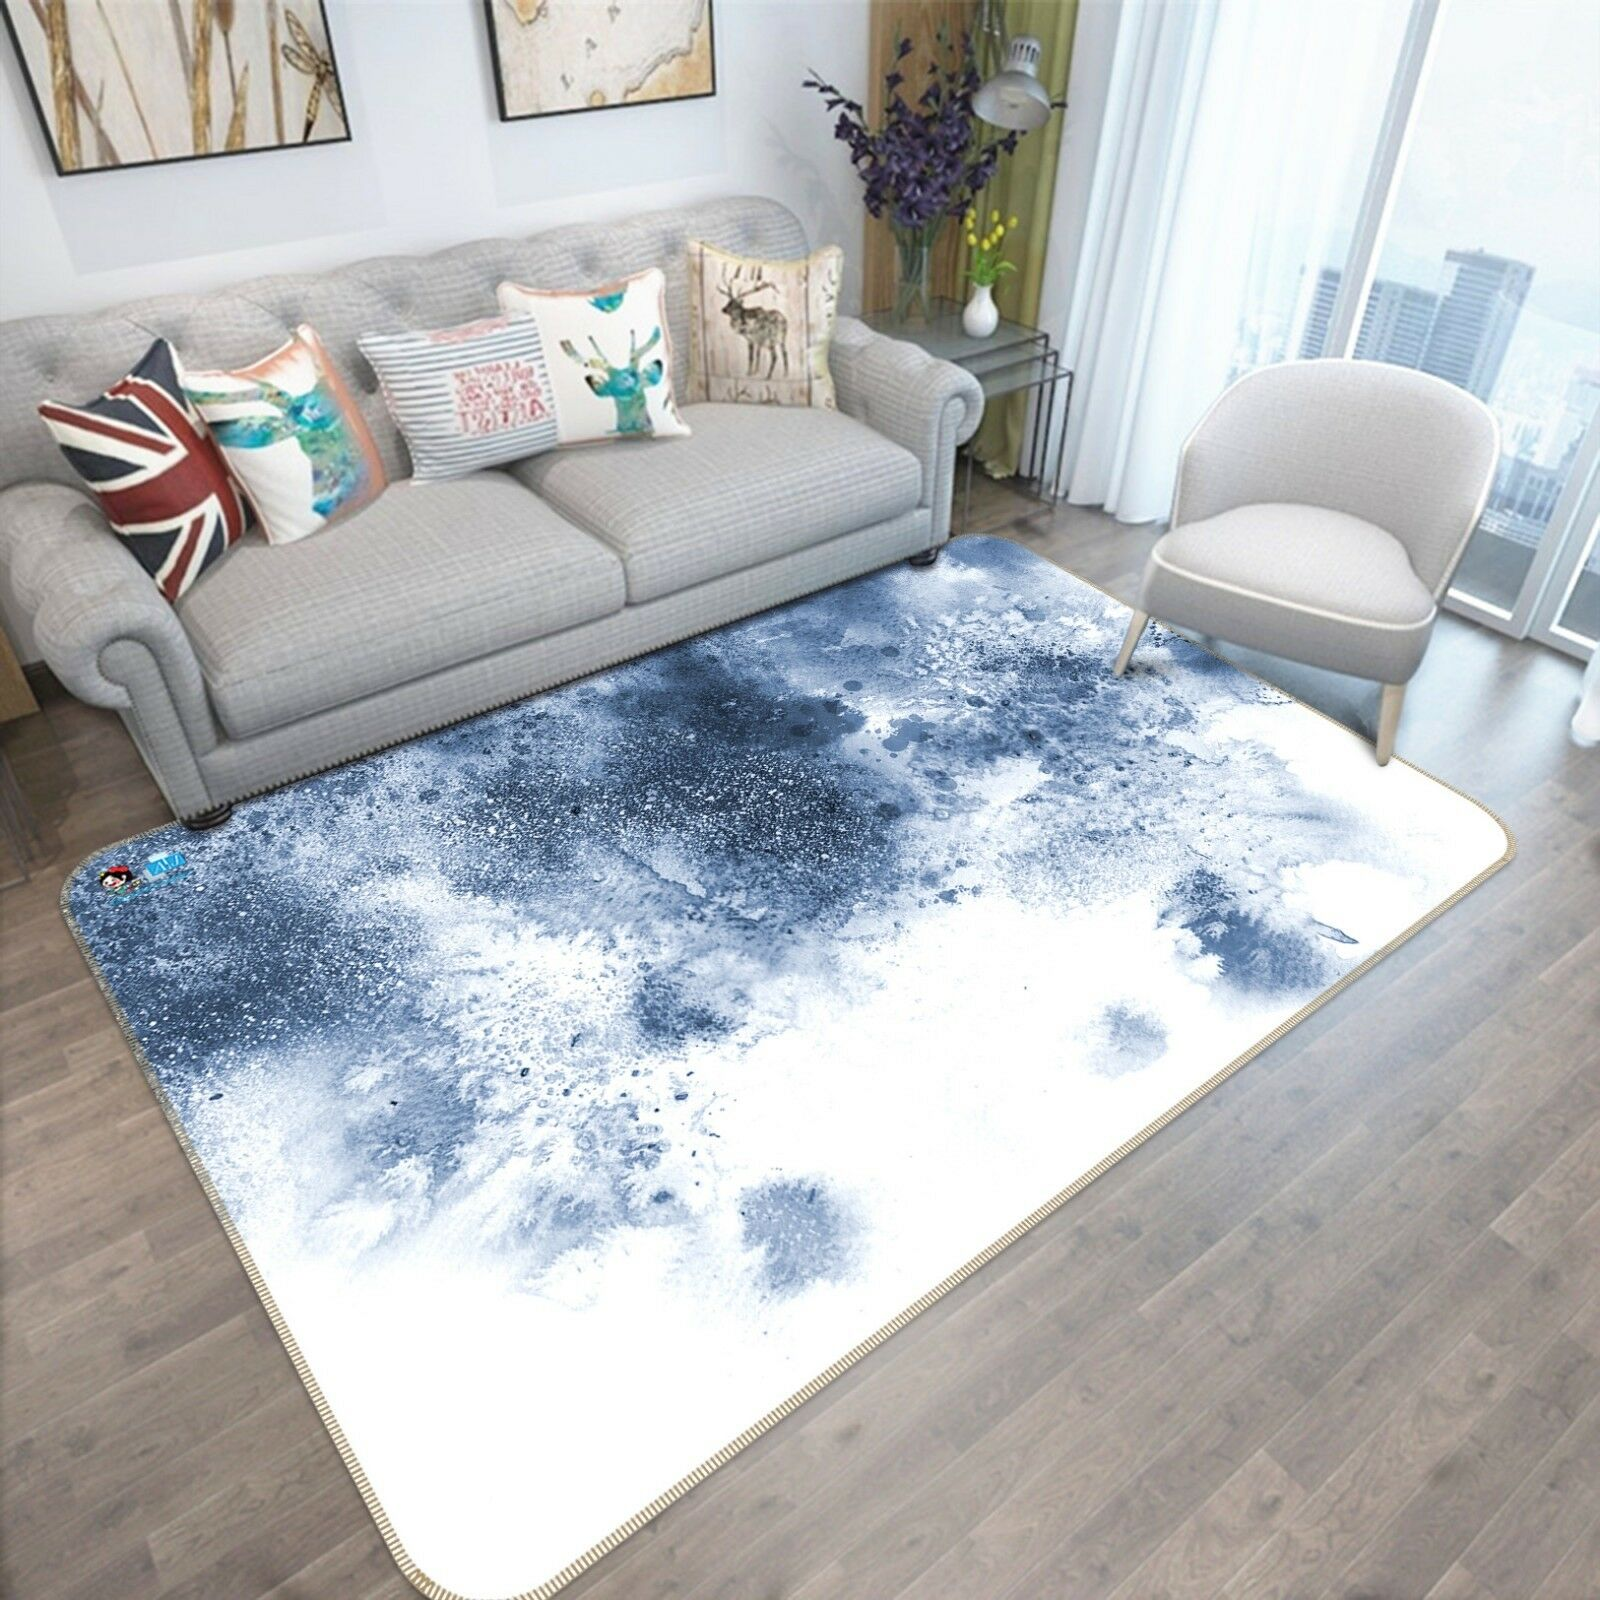 3d tinta graffiti arte 4 antideslizante alfombra maletero calidad elegante alfombra